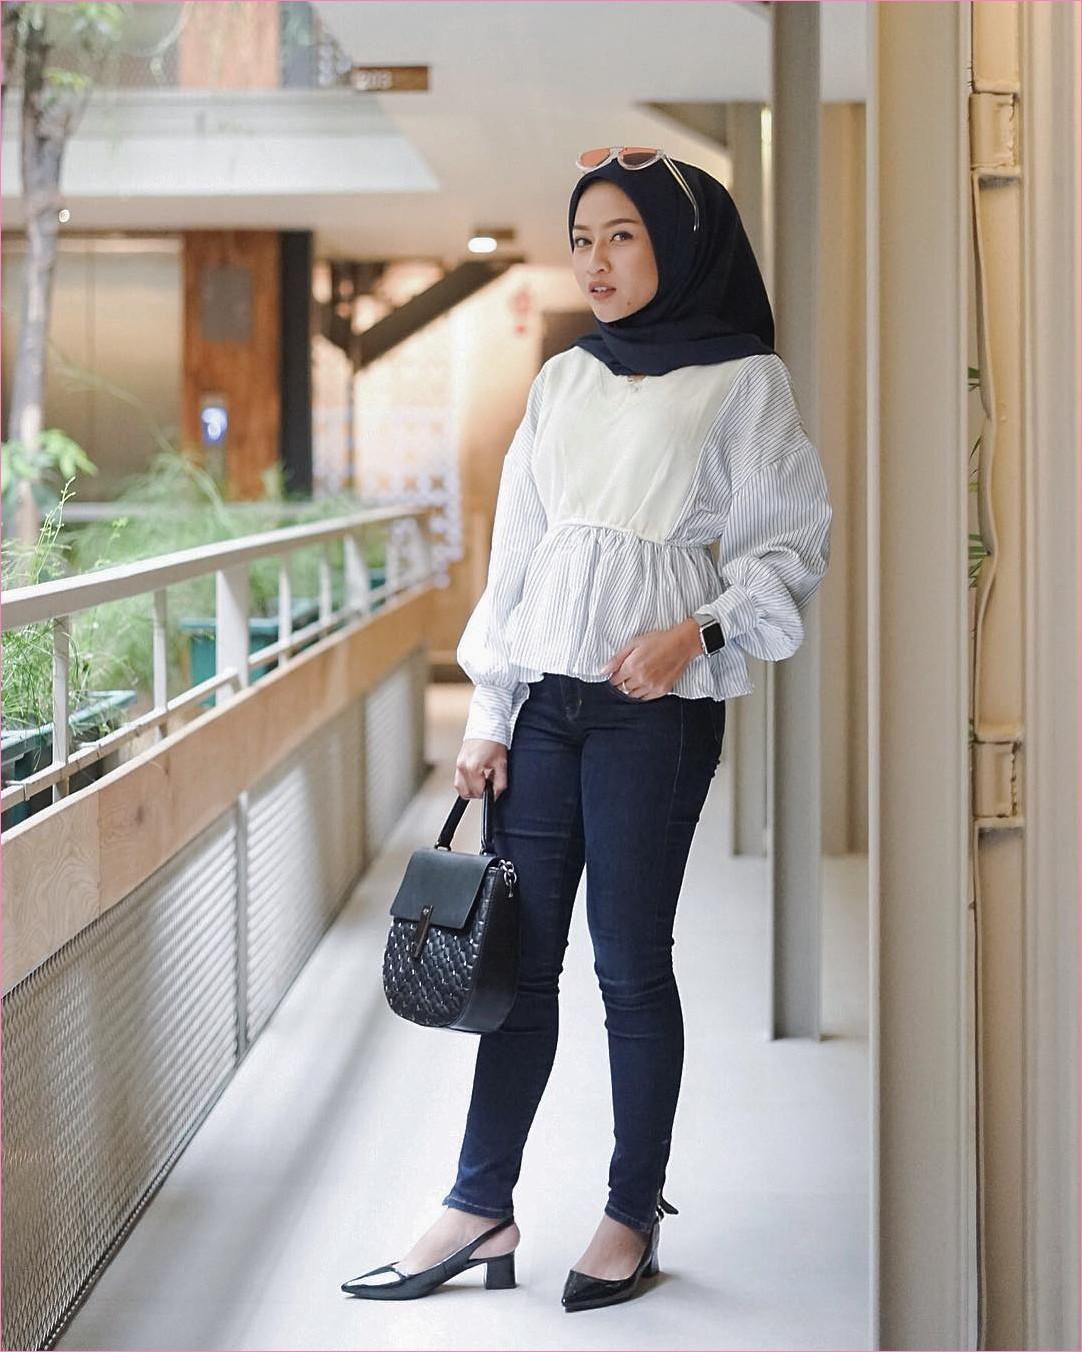 Outfit Baju Top  Blouse Untuk Hijabers Ala Selebgram 2018 Peplum Blouse stripes putih jeans denim biru dongker handbags segiempat hijab square diamond loafers and slip ons heels hitam kacamata jam tangan layar sentuh ootd trendy